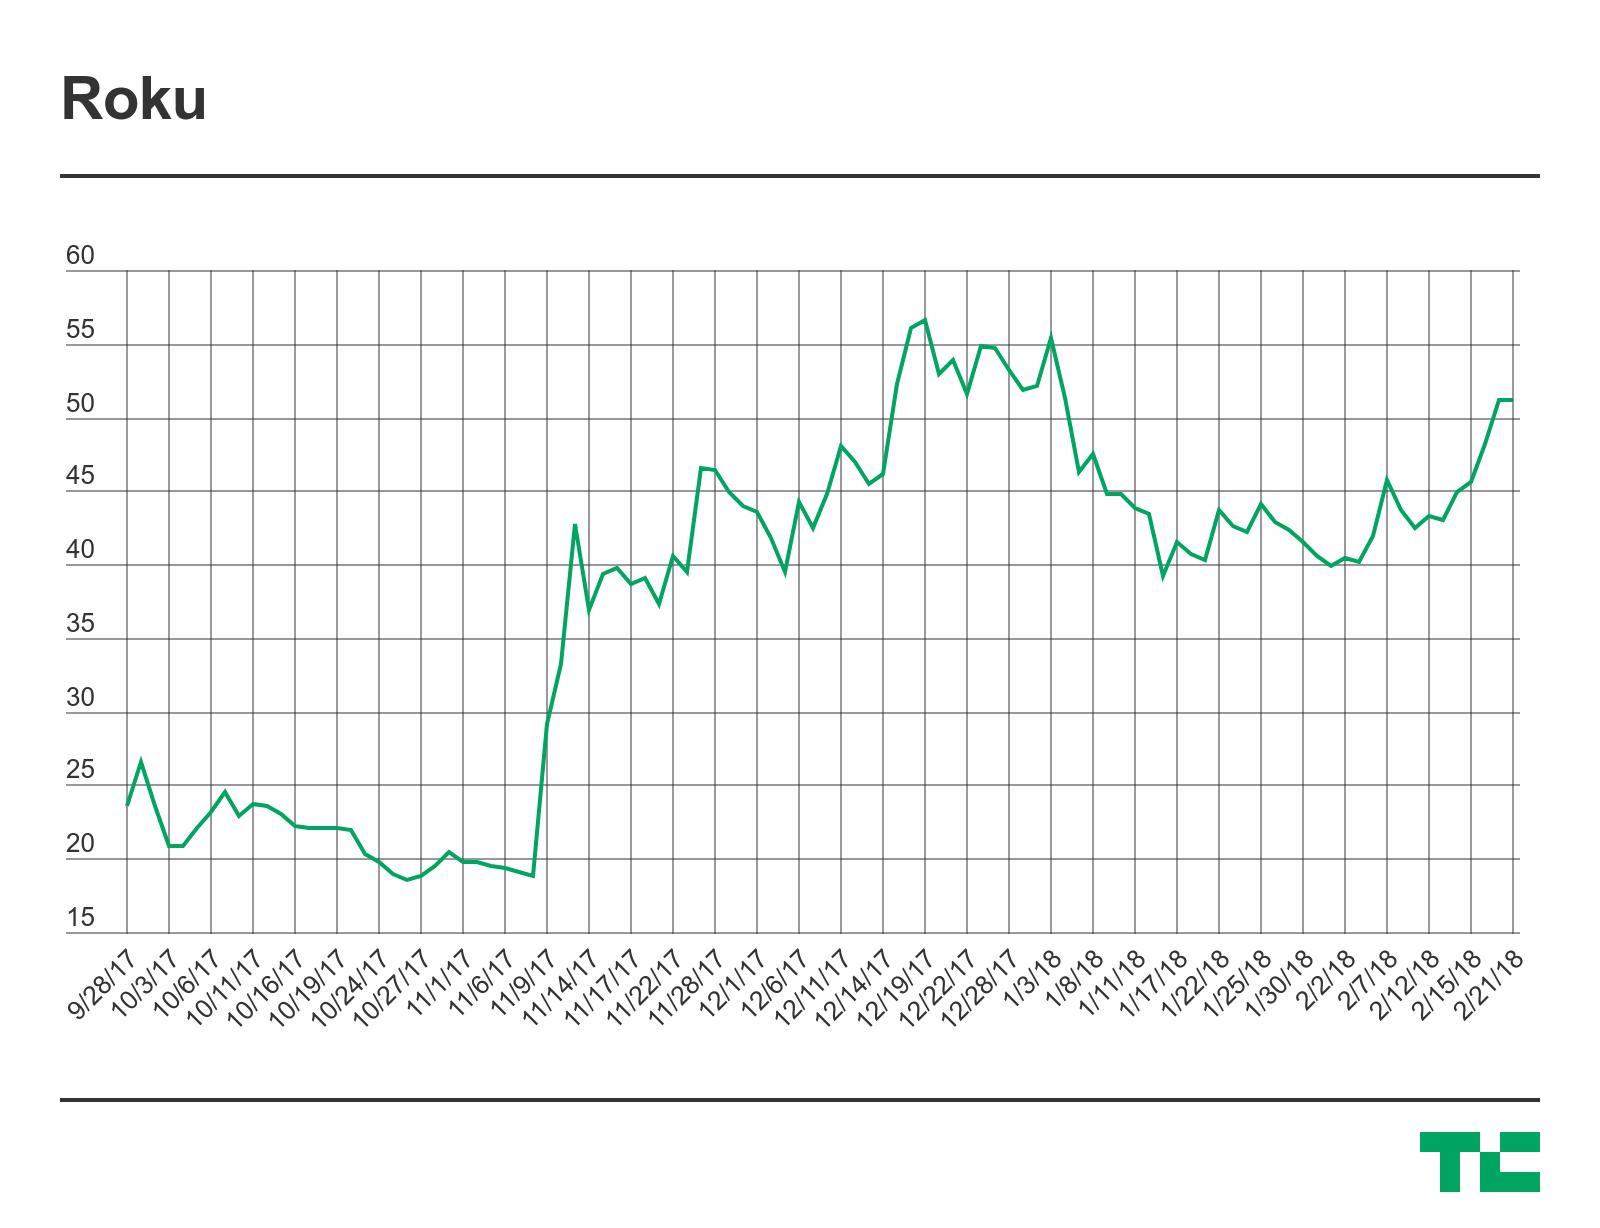 Roku stock tanks 18 after sharing financials outlook techcrunch roku stock tanks 18 after sharing financials outlook buycottarizona